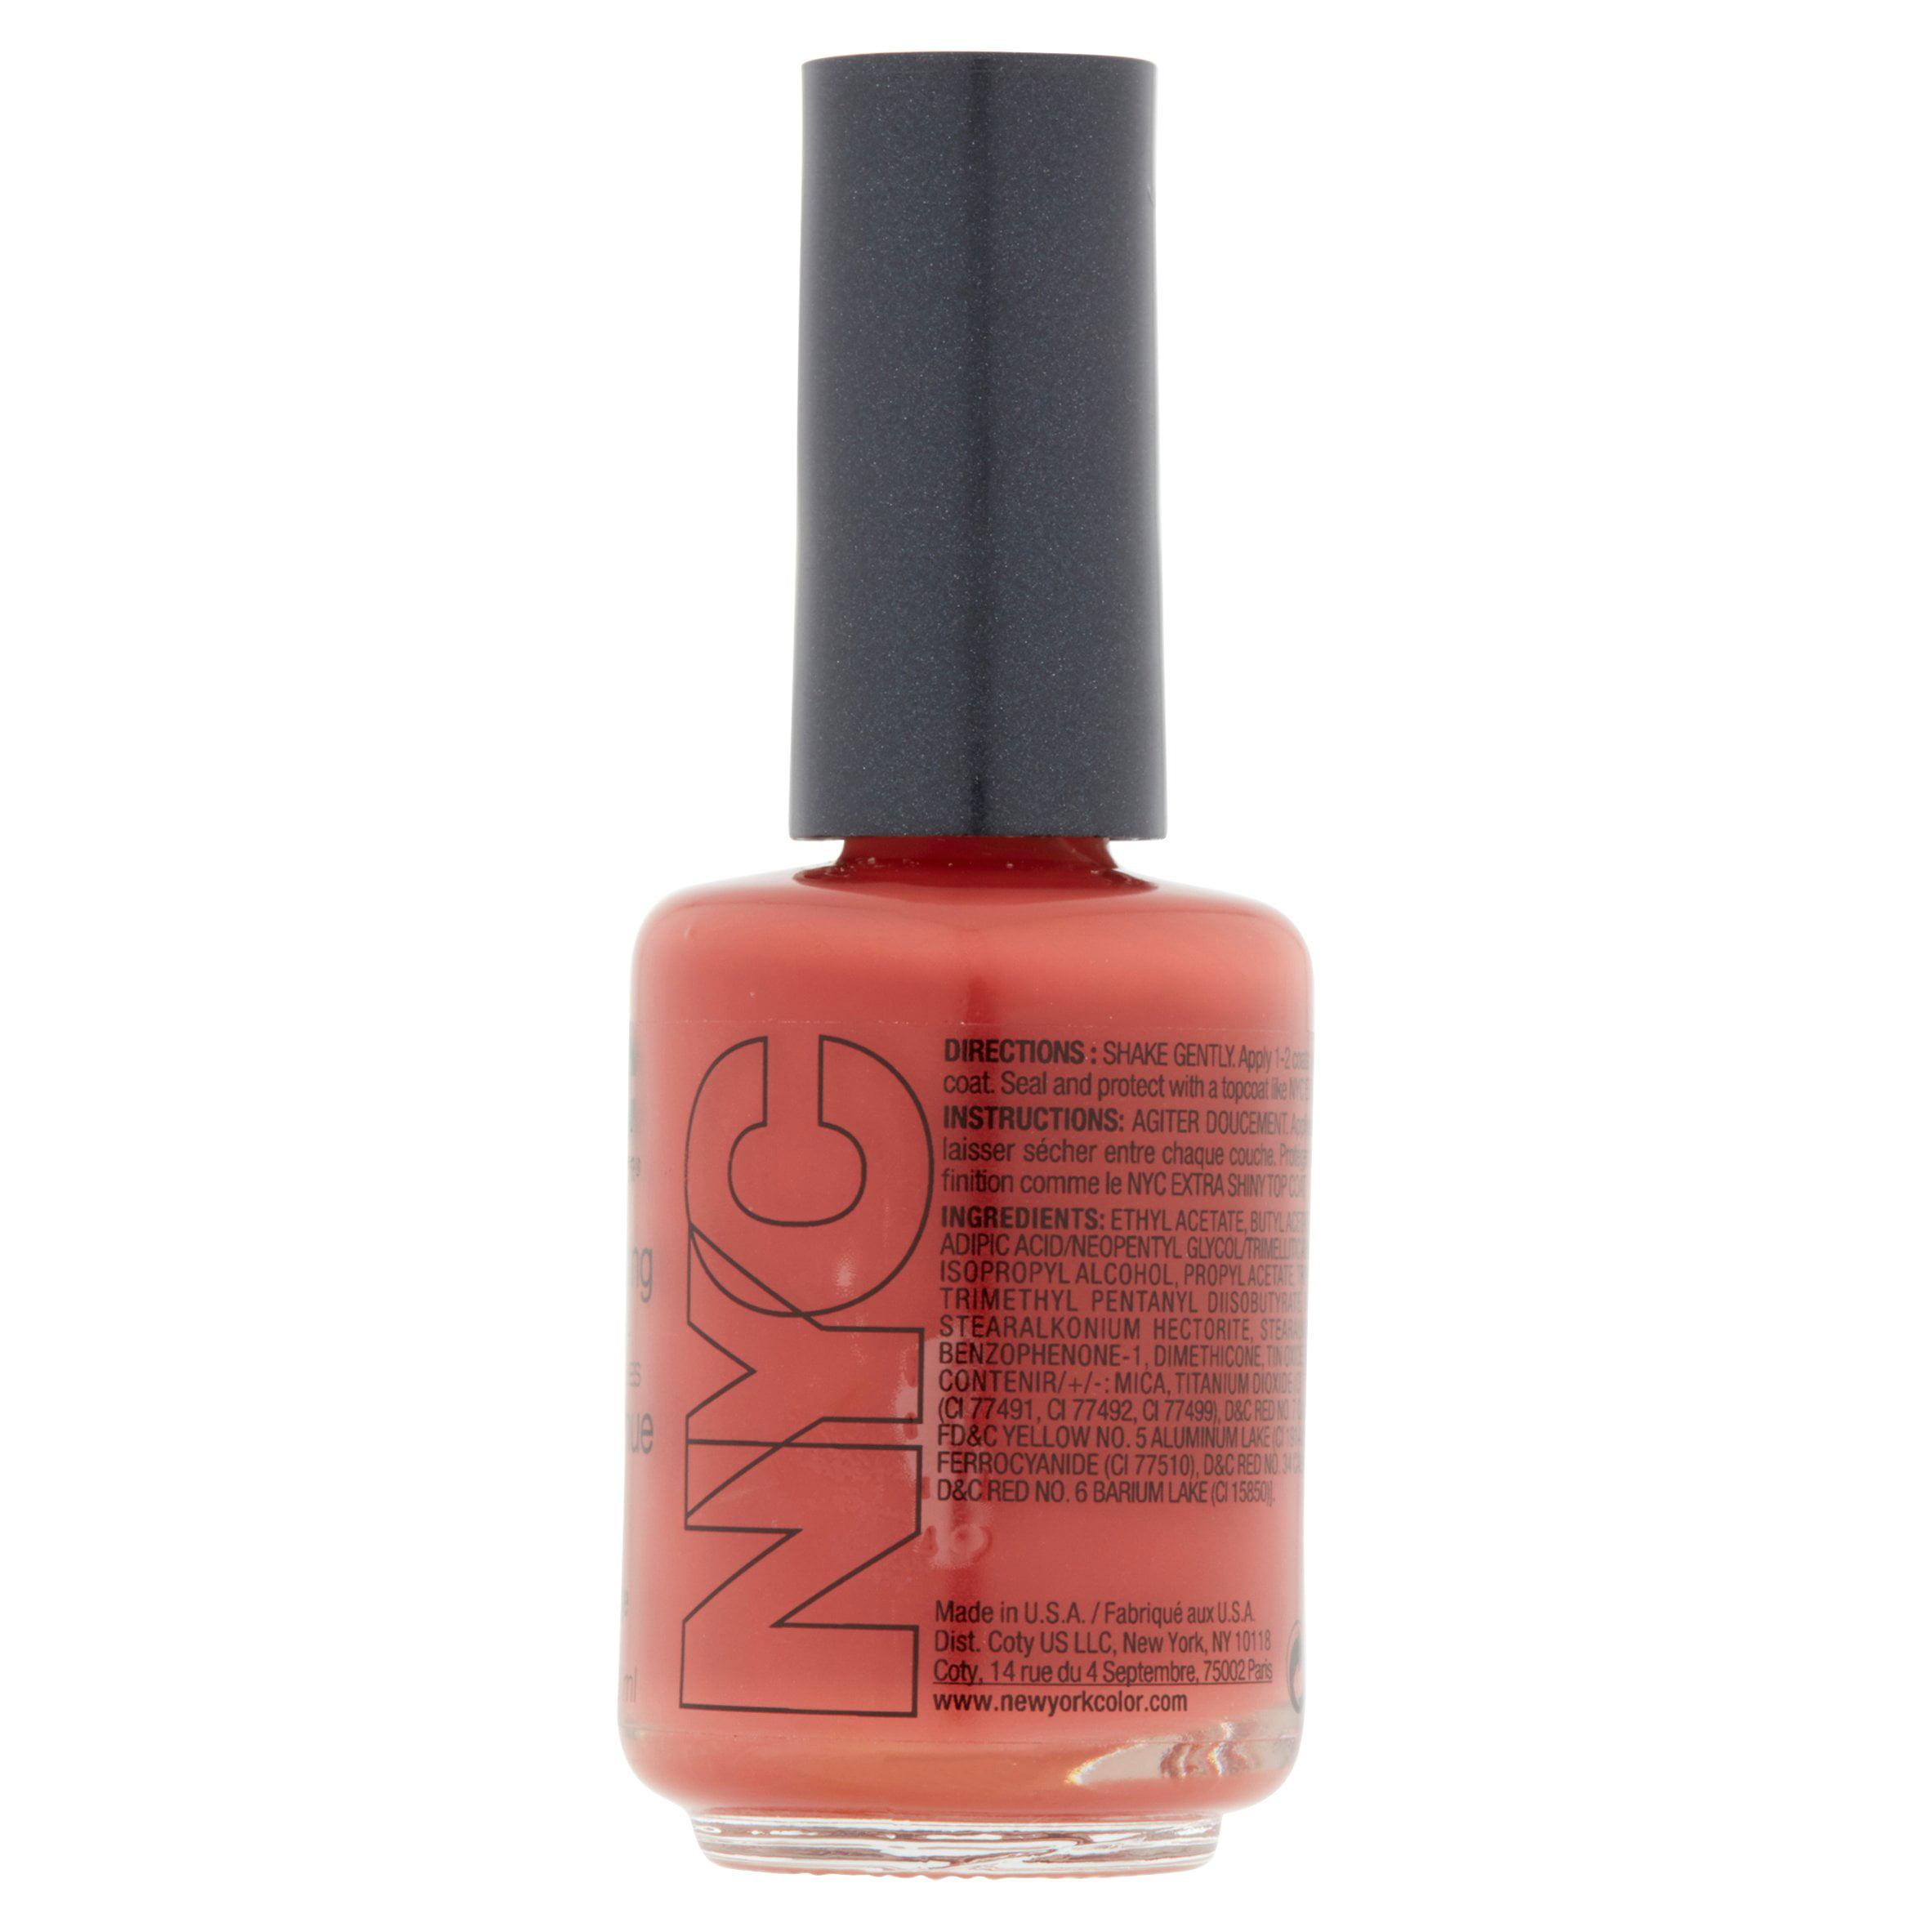 New York Color Long Wearing 161 Burnt Orange Nail Tenue, 0.45 fl oz ...